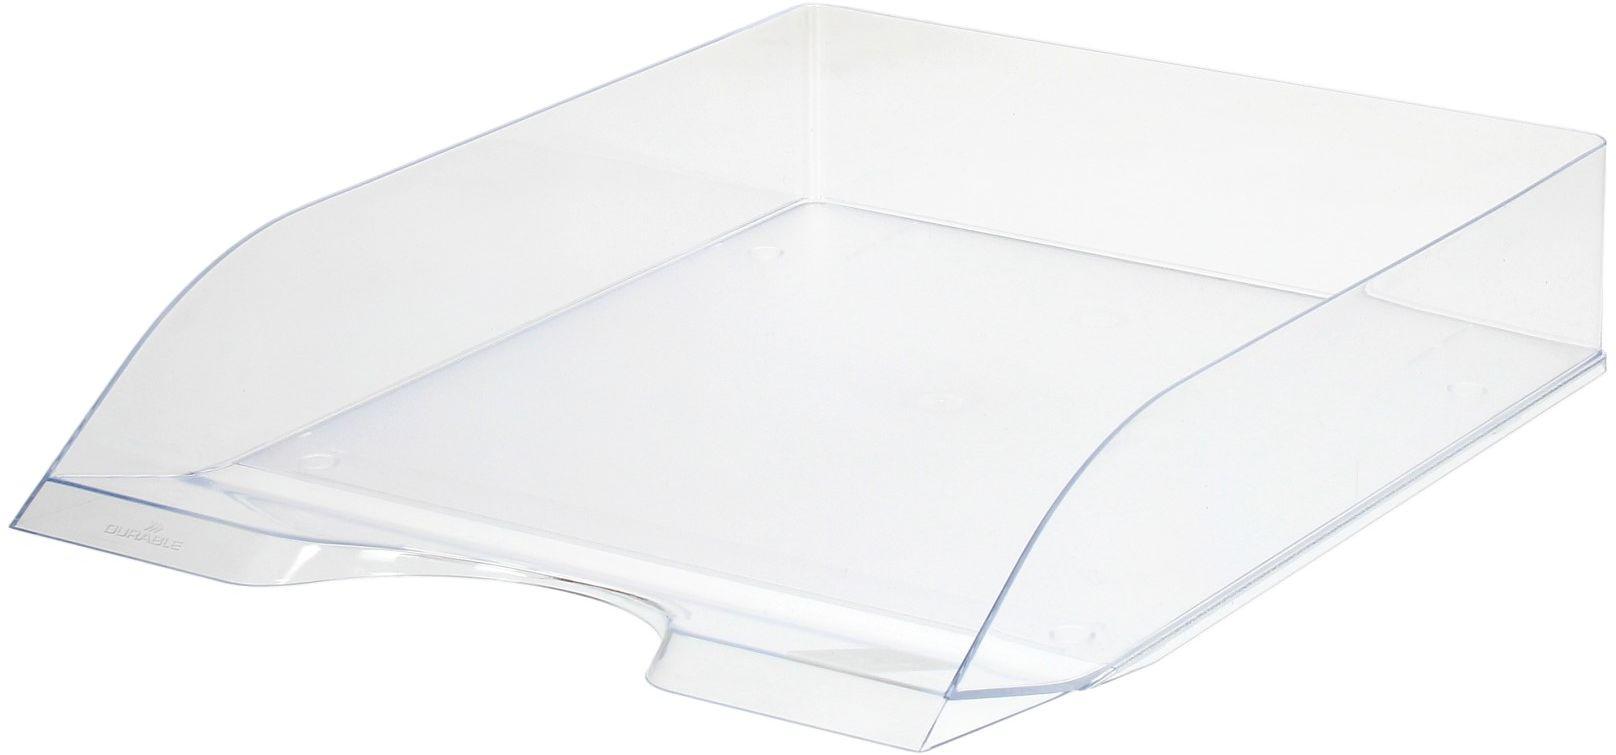 Półka na dokumenty A4 przezroczysta Basic Durable